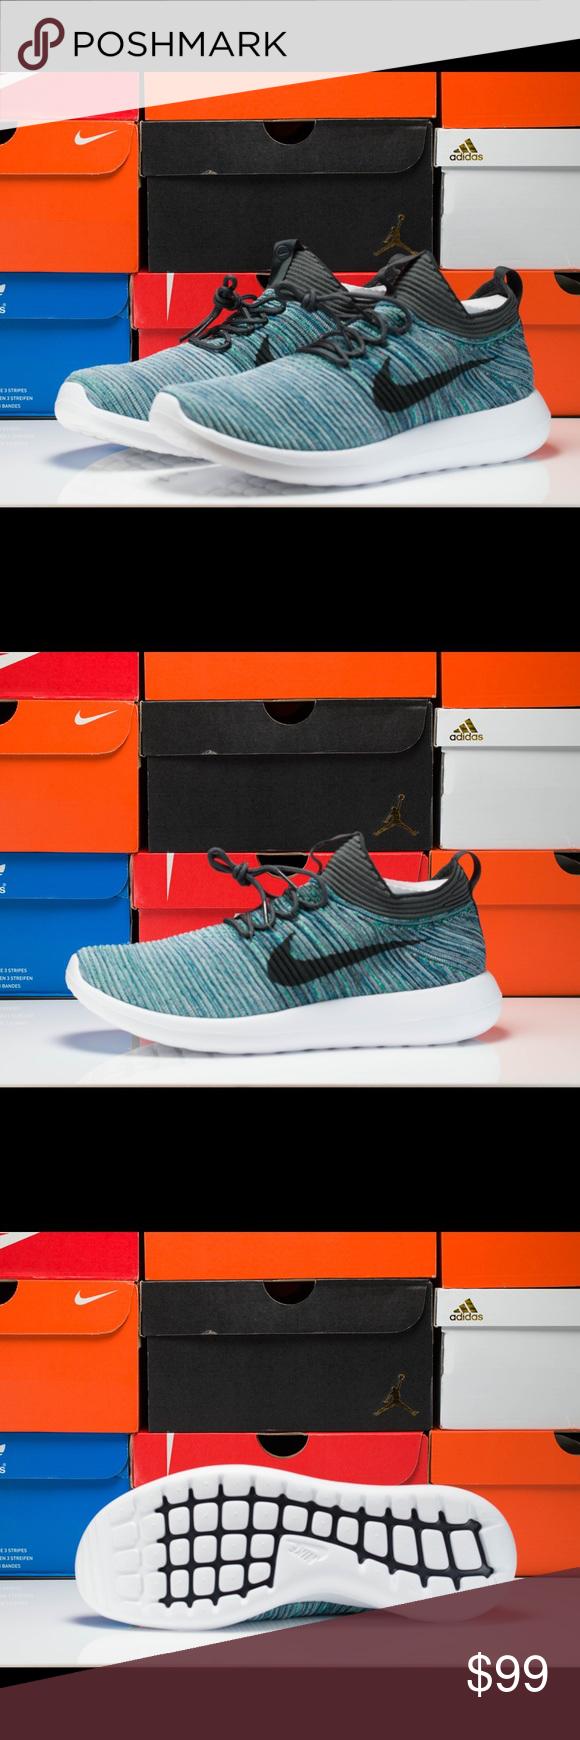 hot sale online 5171c c2318 Nike Roshe Two Flyknit V2 ( 918263-300 ) Nike Roshe Flyknit V2 Running  Shoes Color  Green Abyss   Mica Blue Size  10.5 US   9.5 UK   44.5 EUR  Style  ...